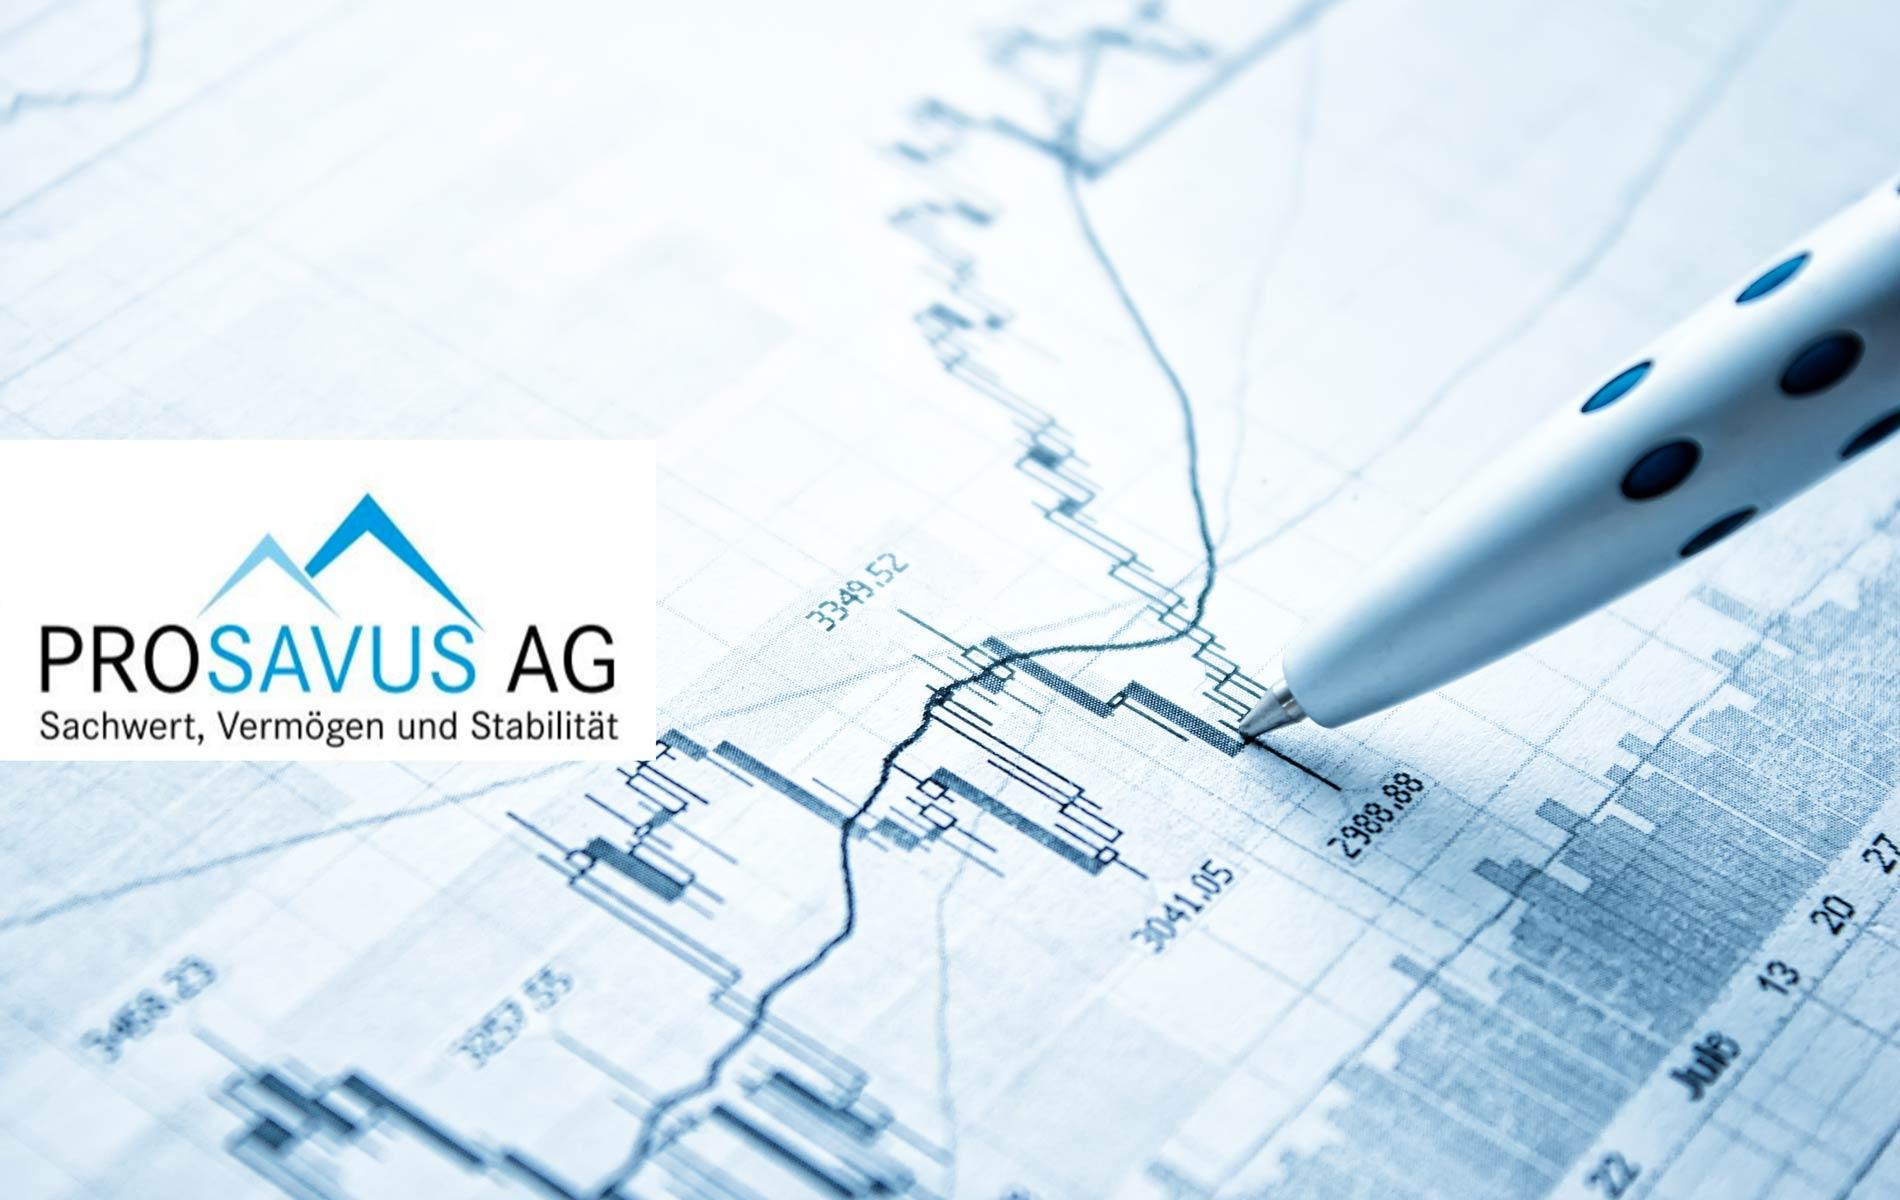 Prosavus AG in der Krise